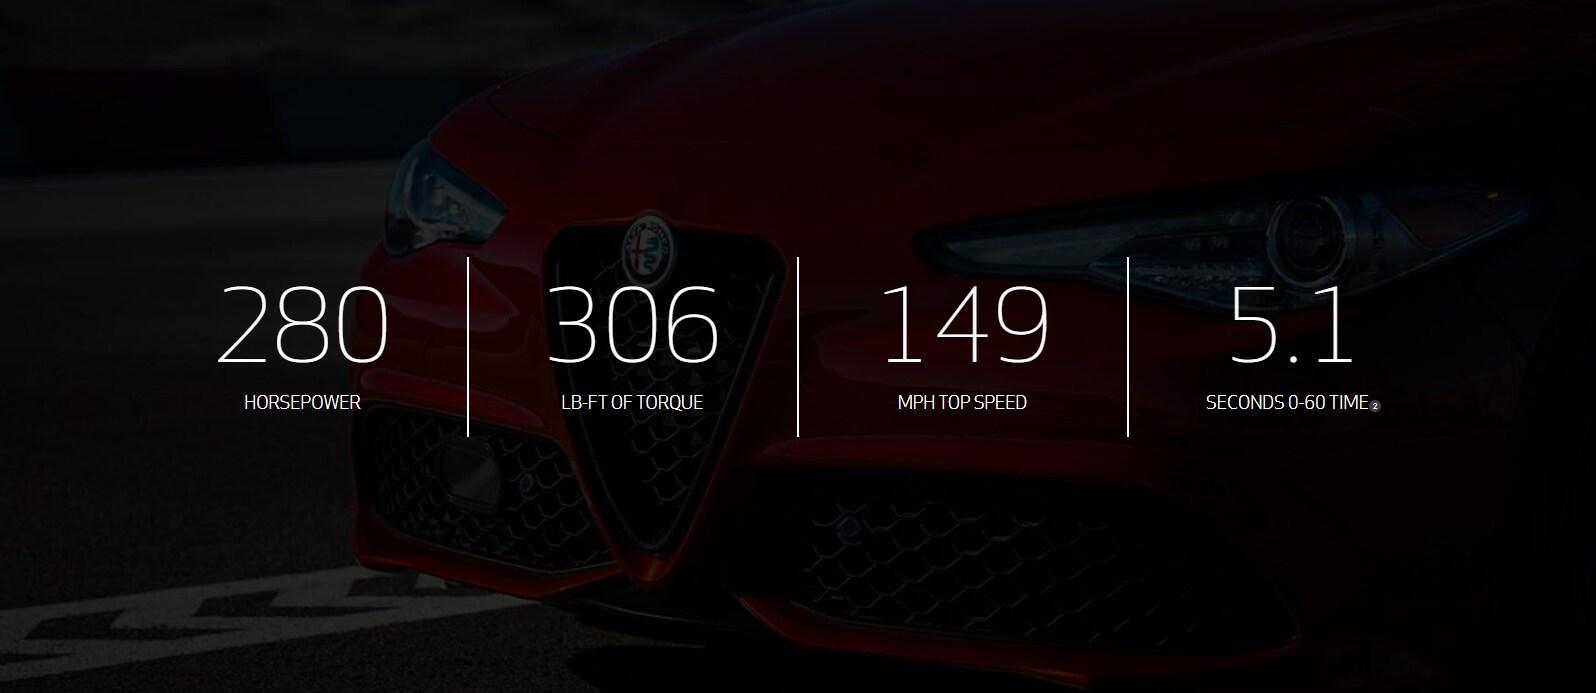 2019 Alfa Romeo Giulia Features Deatils And Specs